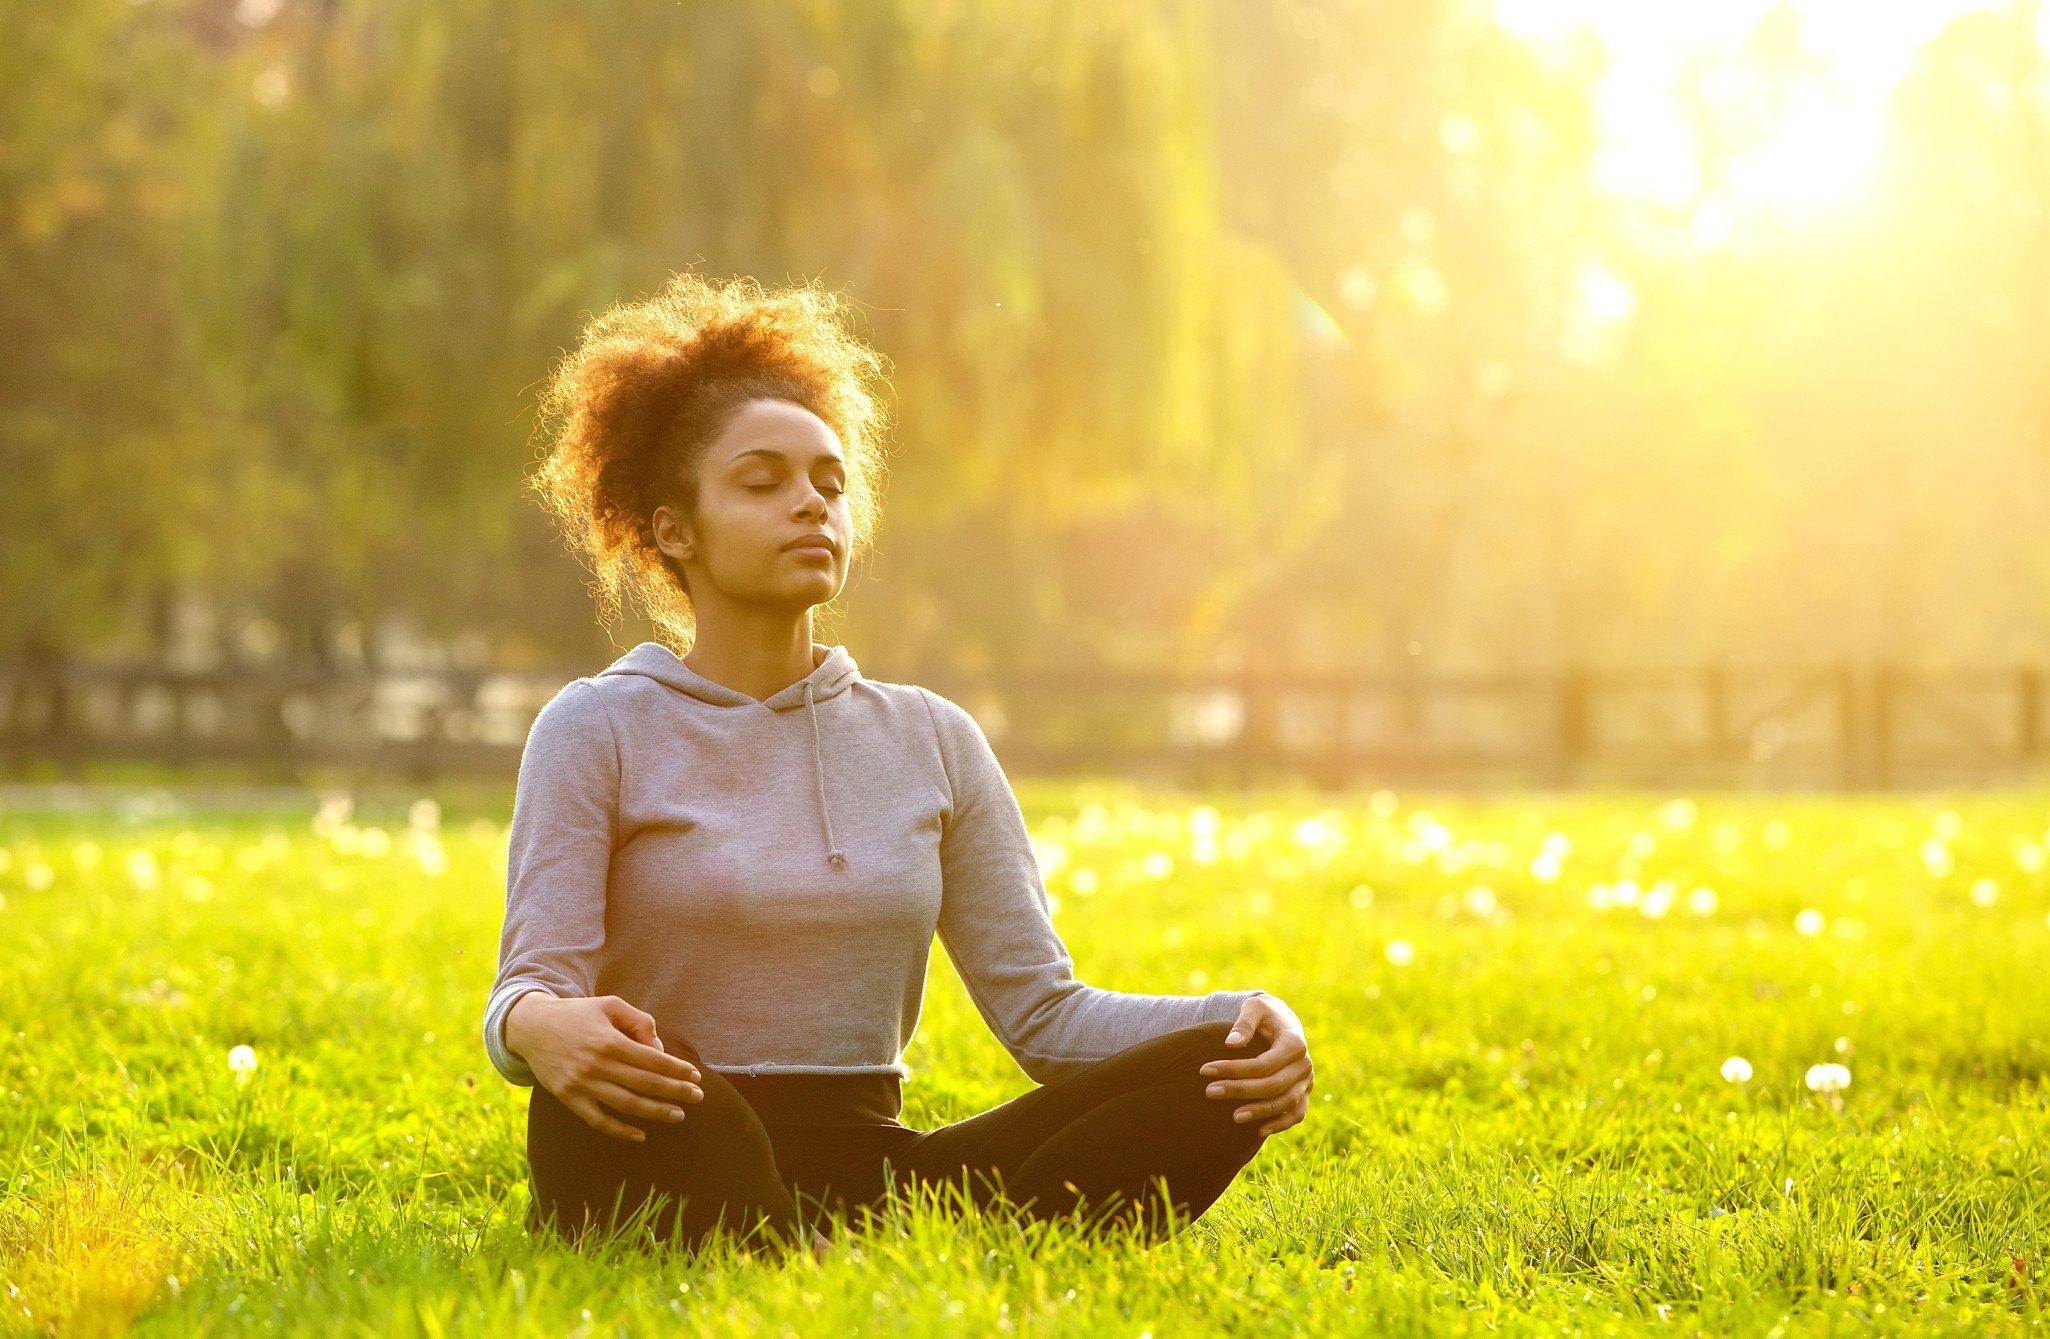 bigstock-African-American-Woman-Meditat-92821154-2050x1339_f_improf_2050x1339